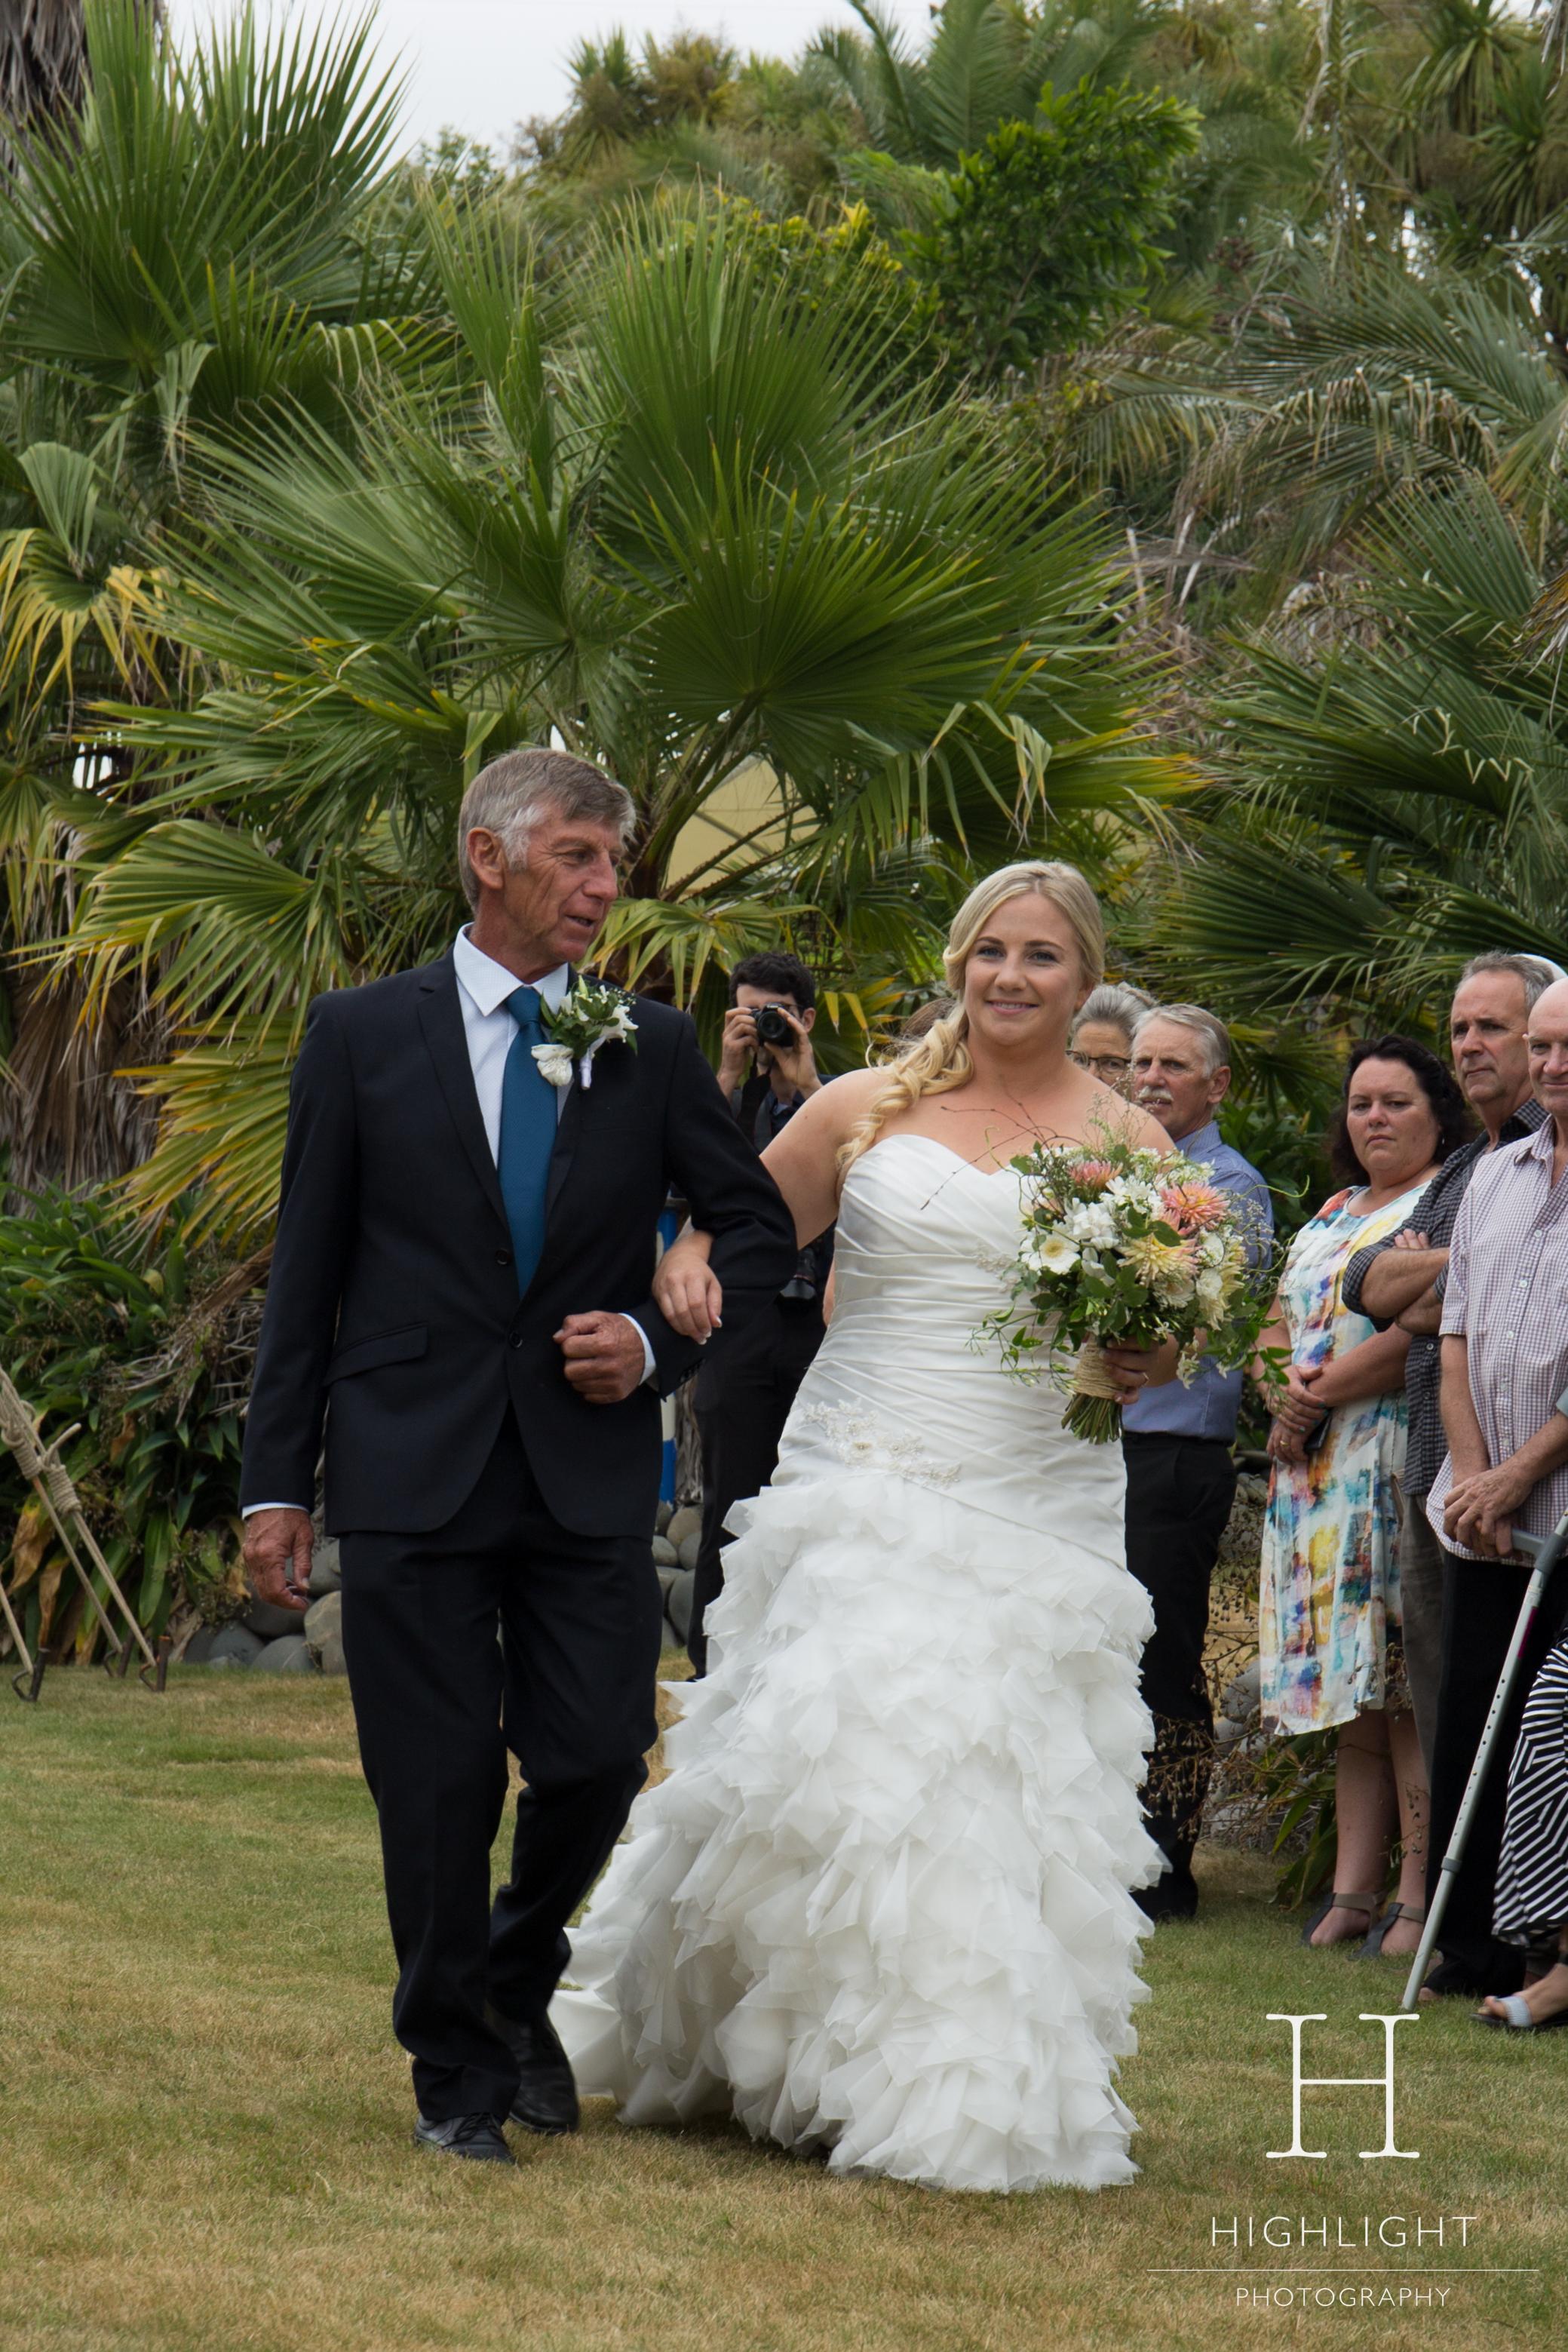 highlight_photography_wedding_new_zealand_flowergirl.jpg